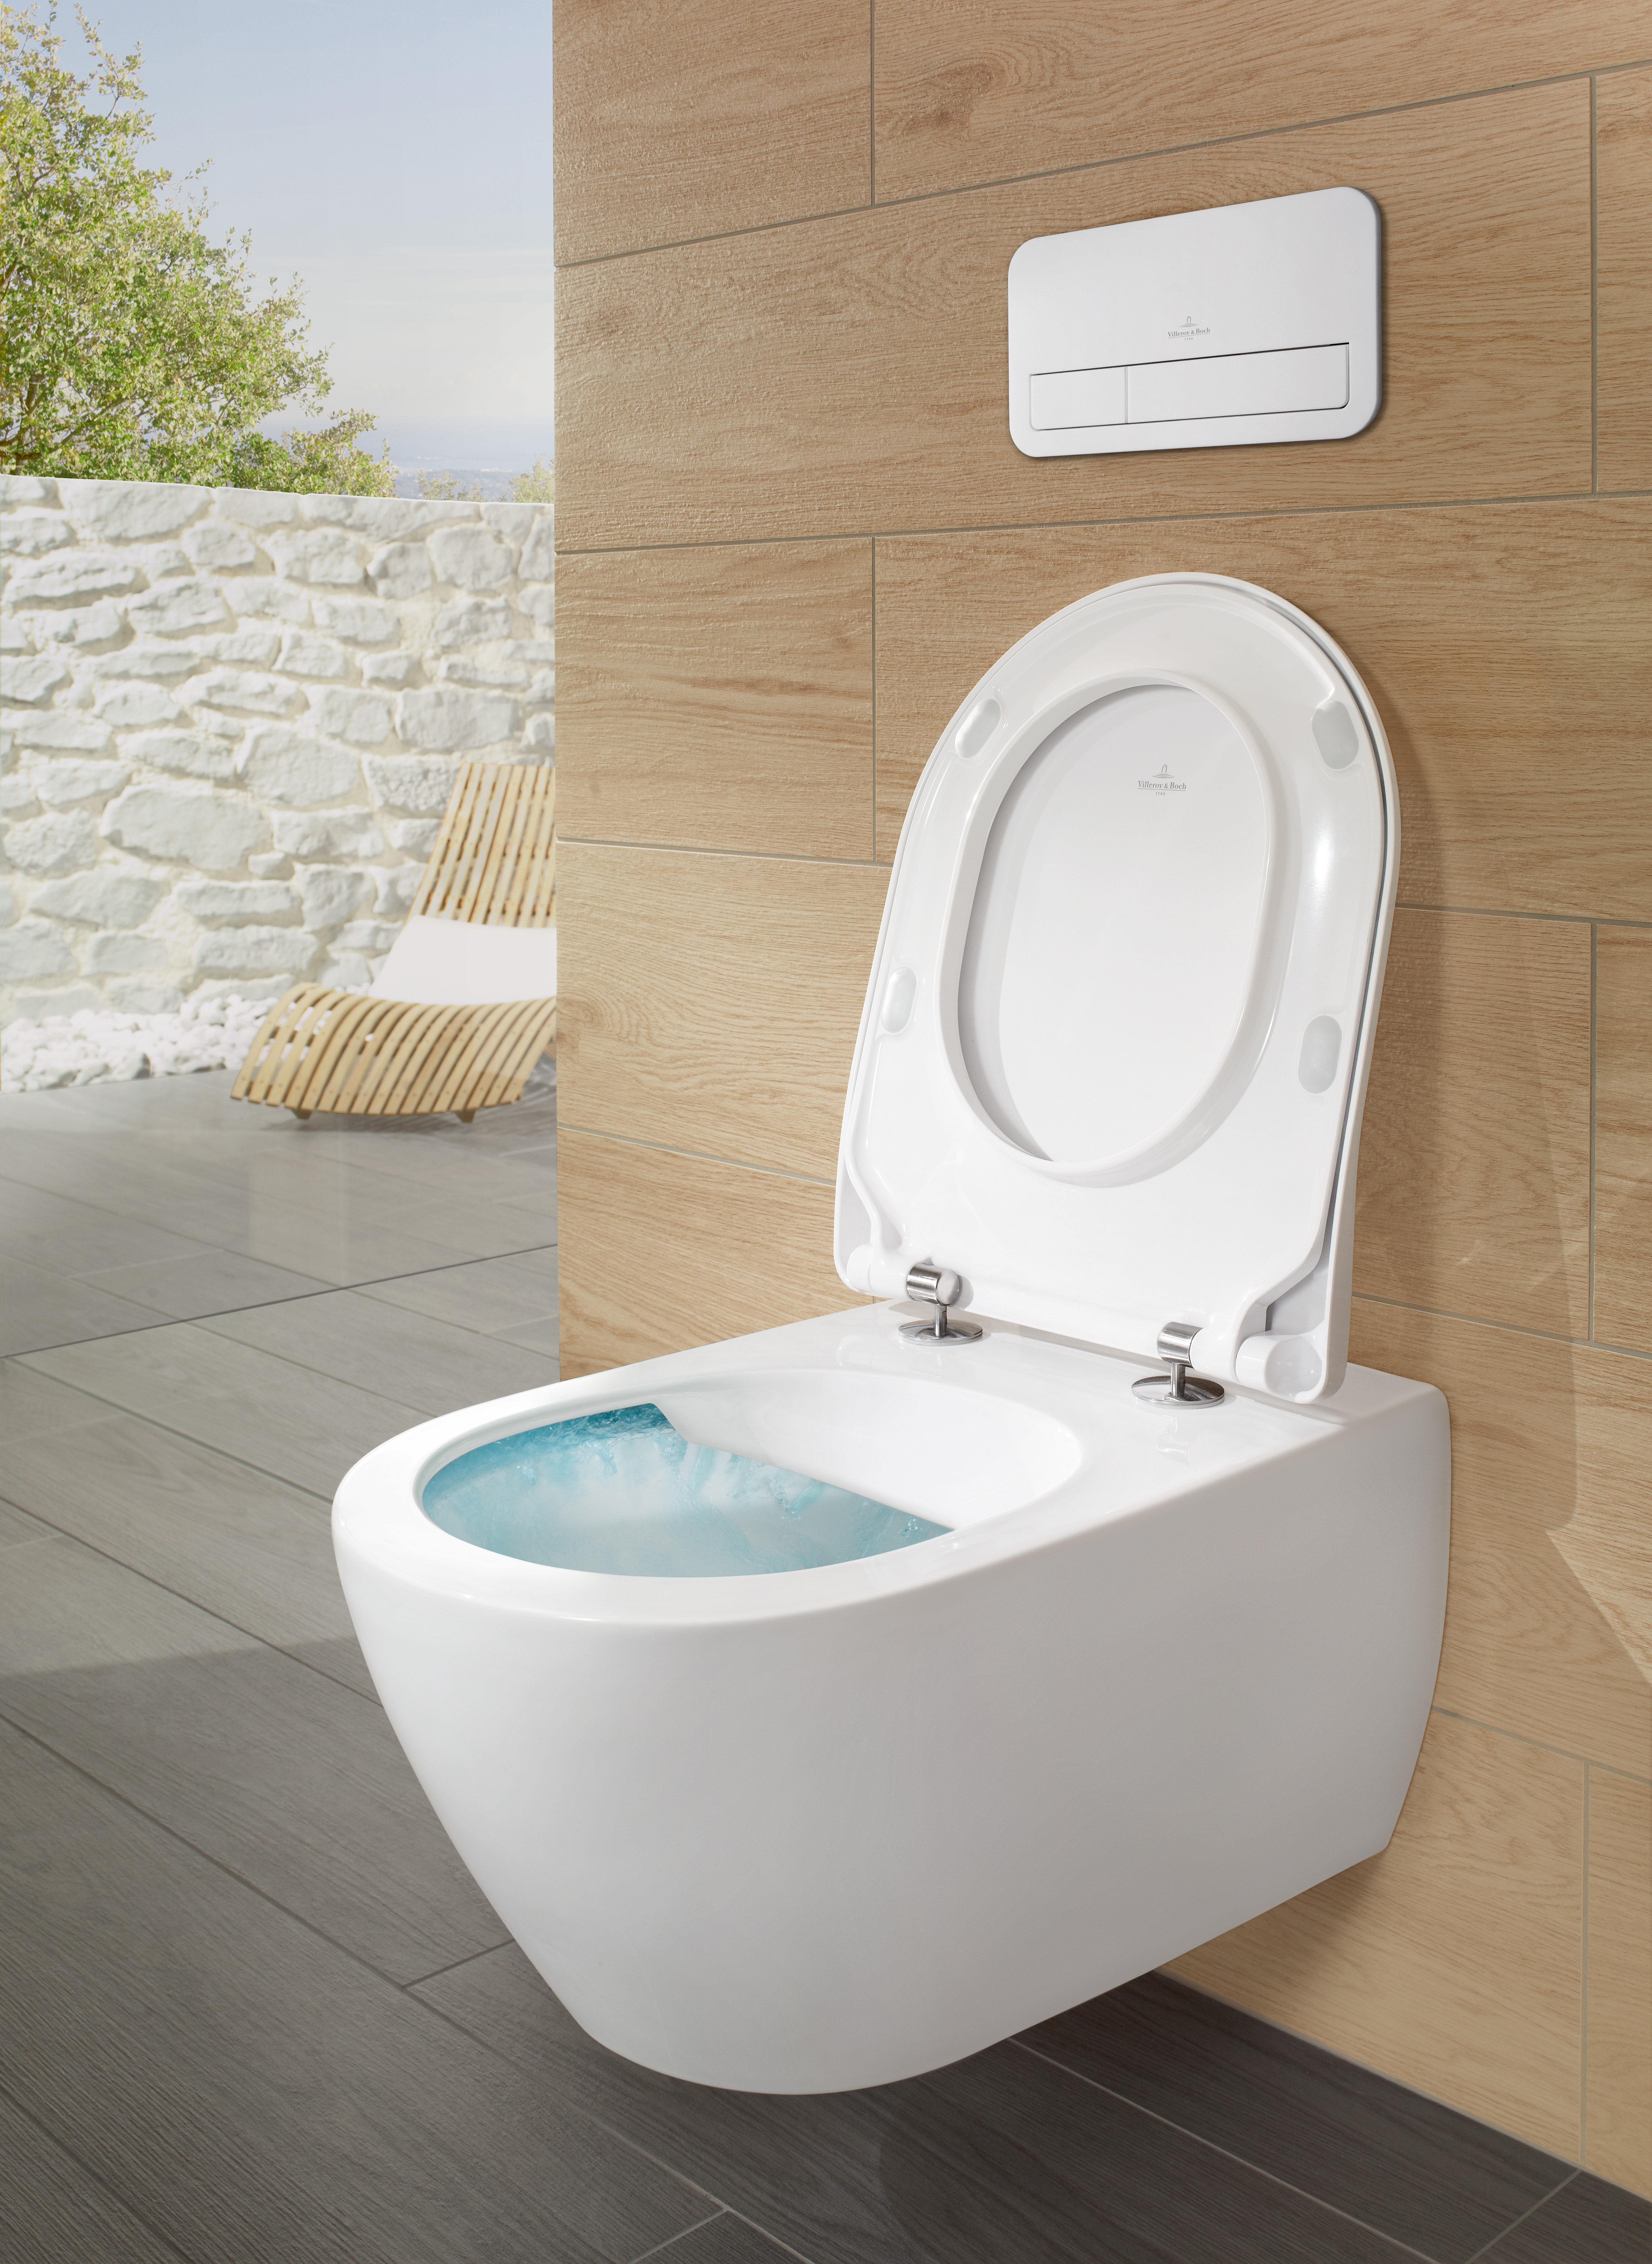 Subway WCs, Wall-mounted WC, Toilets, Wall-mounted